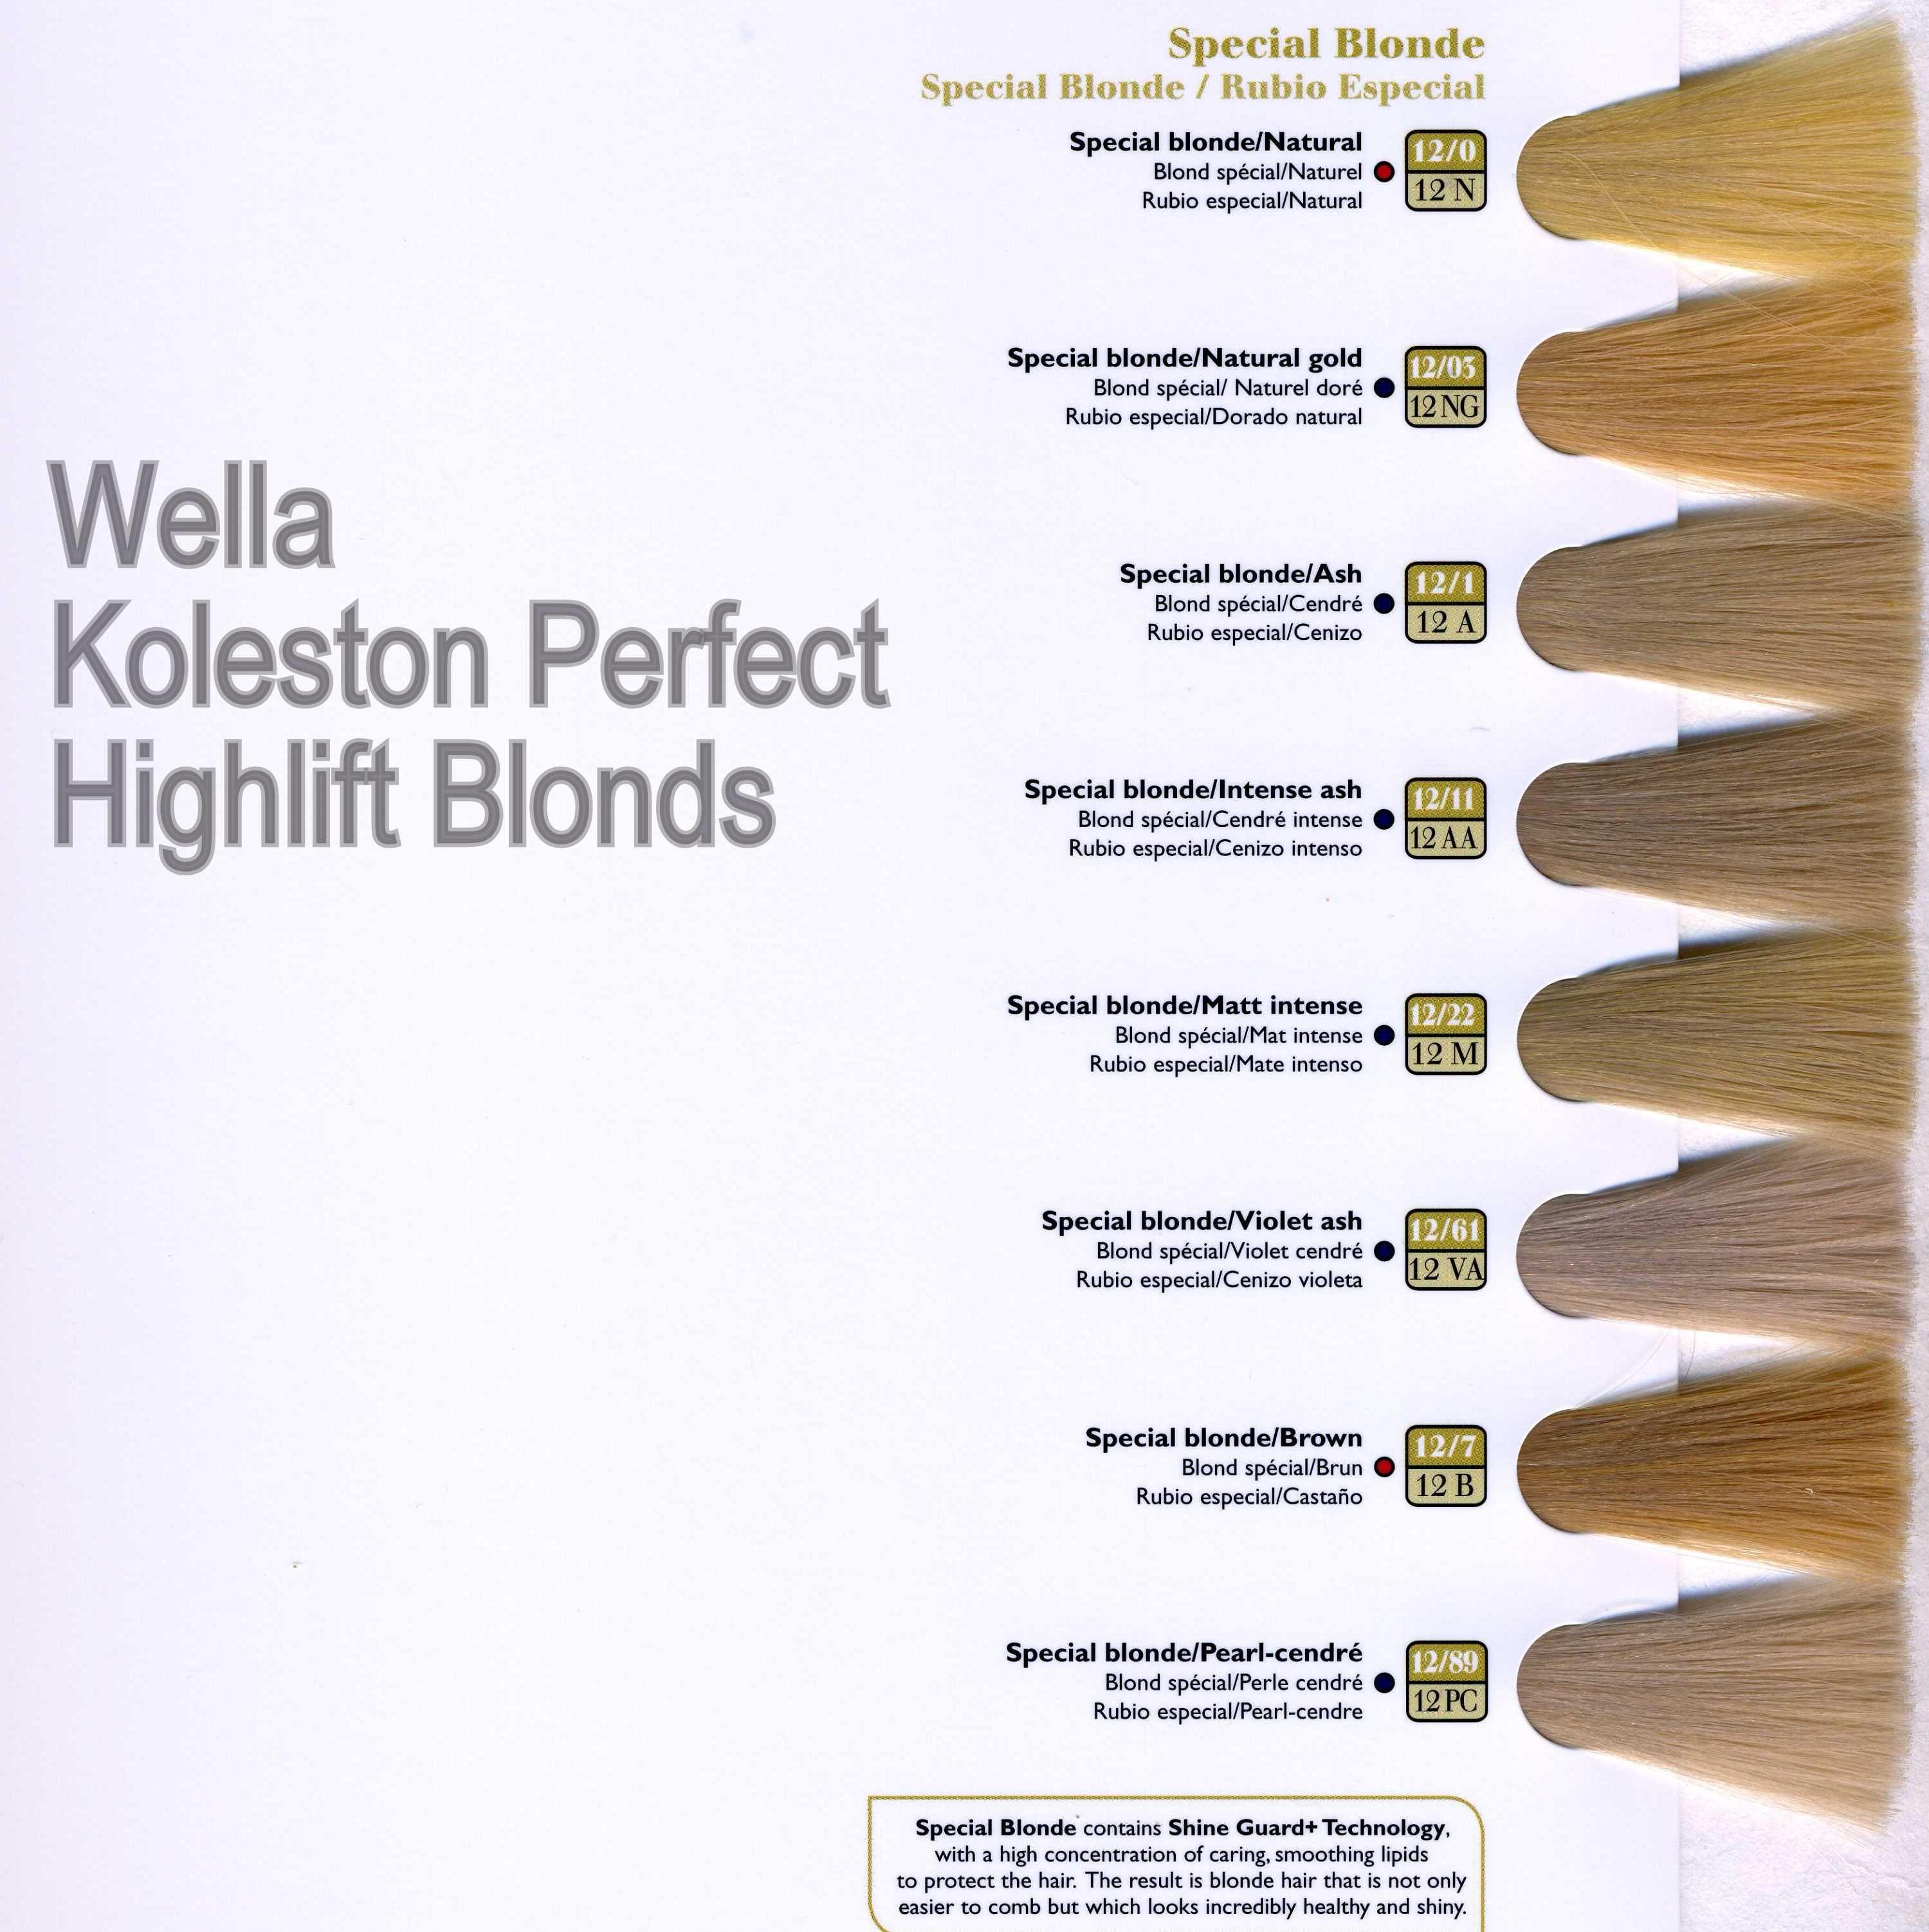 Wella Koleston Perfect Highlift Blonds Dyed Hair Balayage Hair Wella